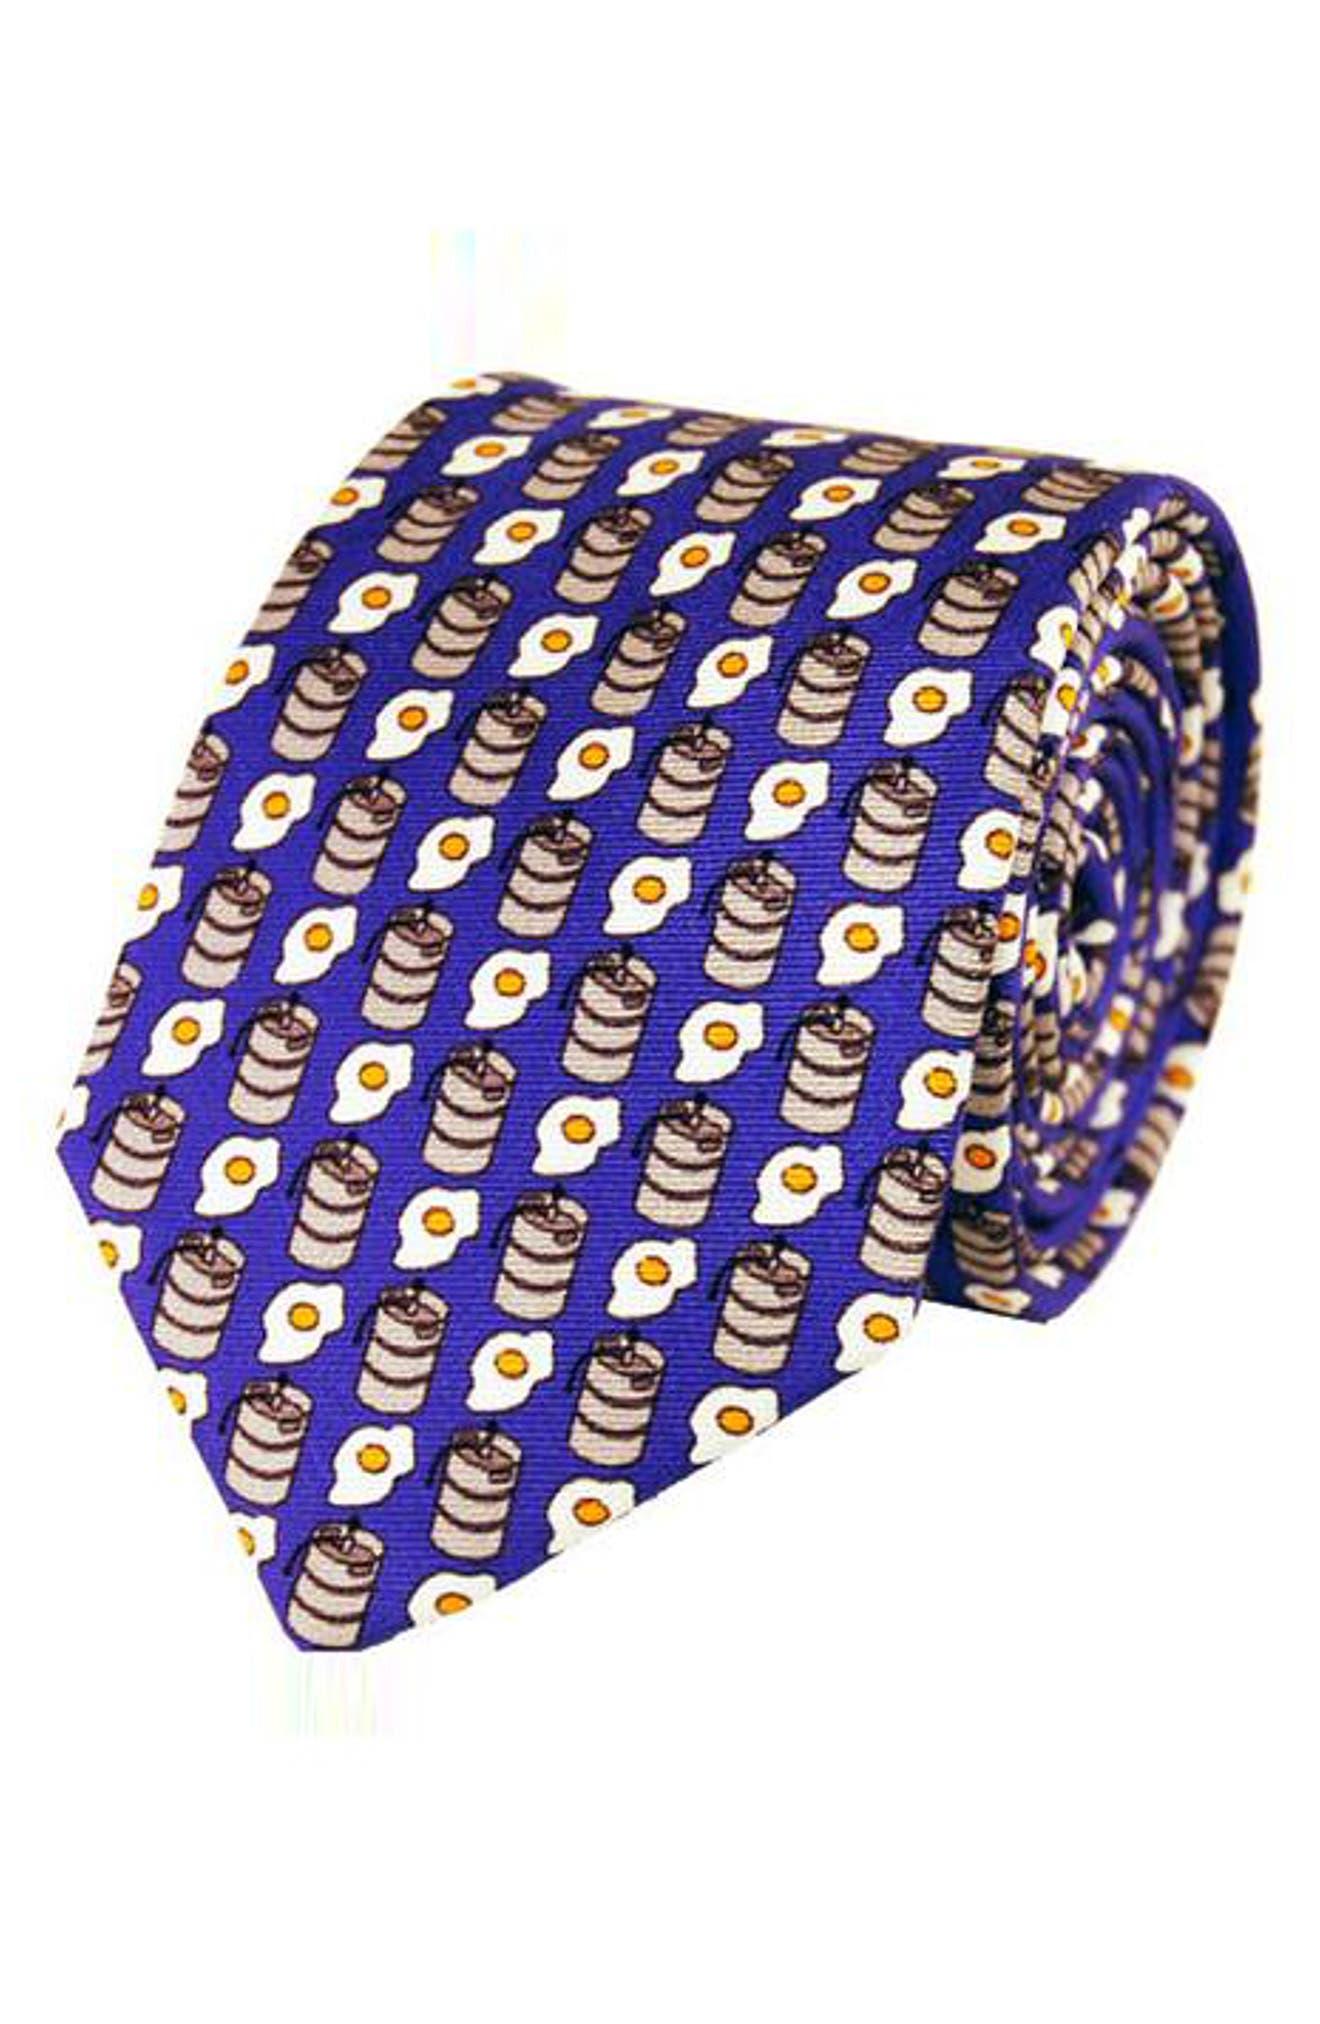 Kegs & Eggs Silk Tie,                             Main thumbnail 1, color,                             420